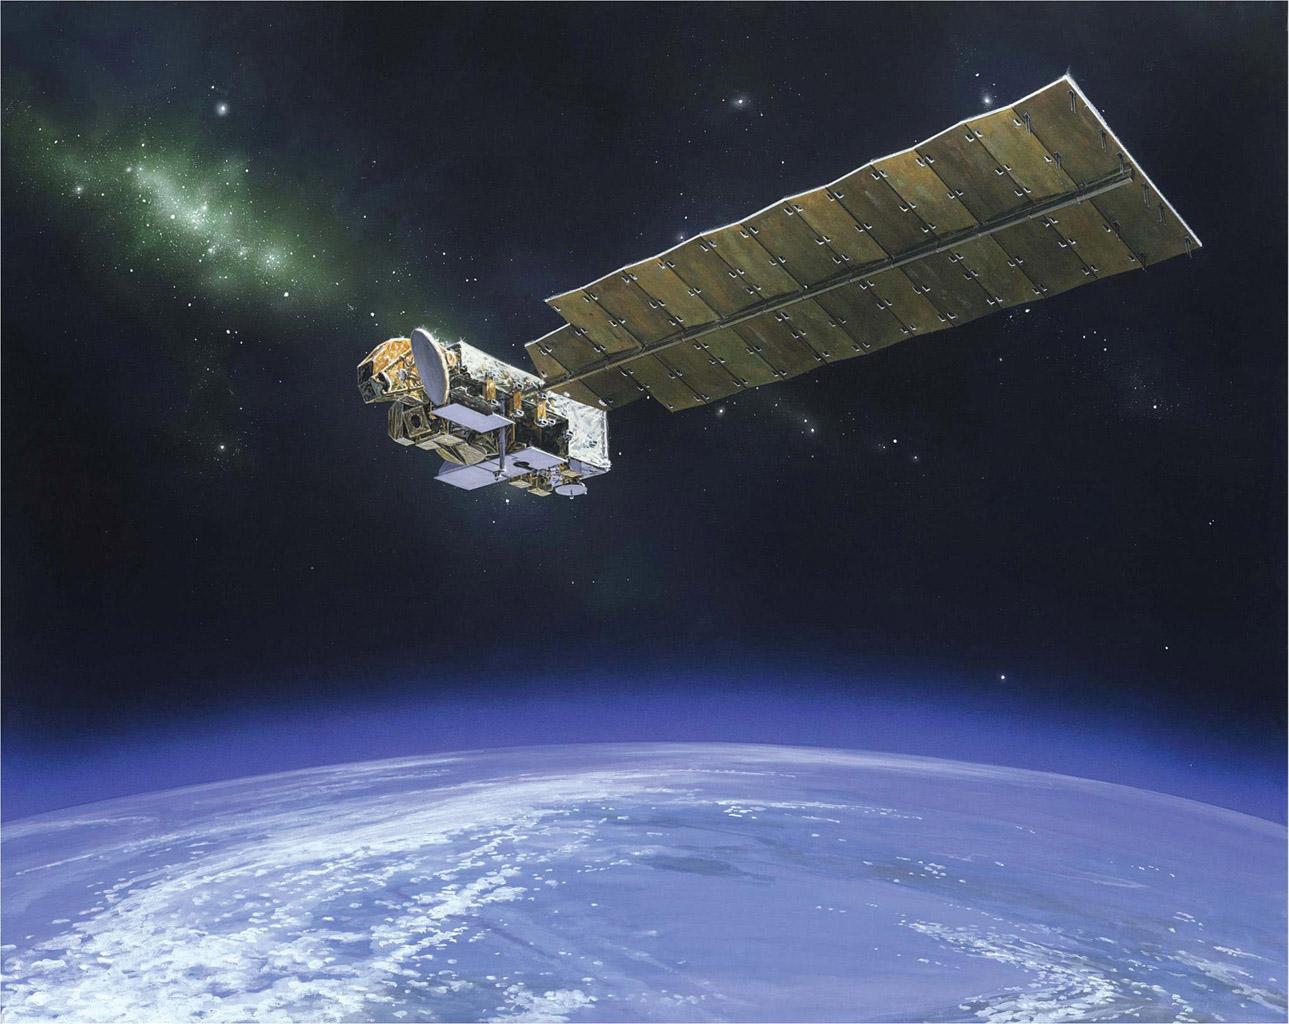 Space Images | NASA's Aura Spacecraft (Artist's Concept)